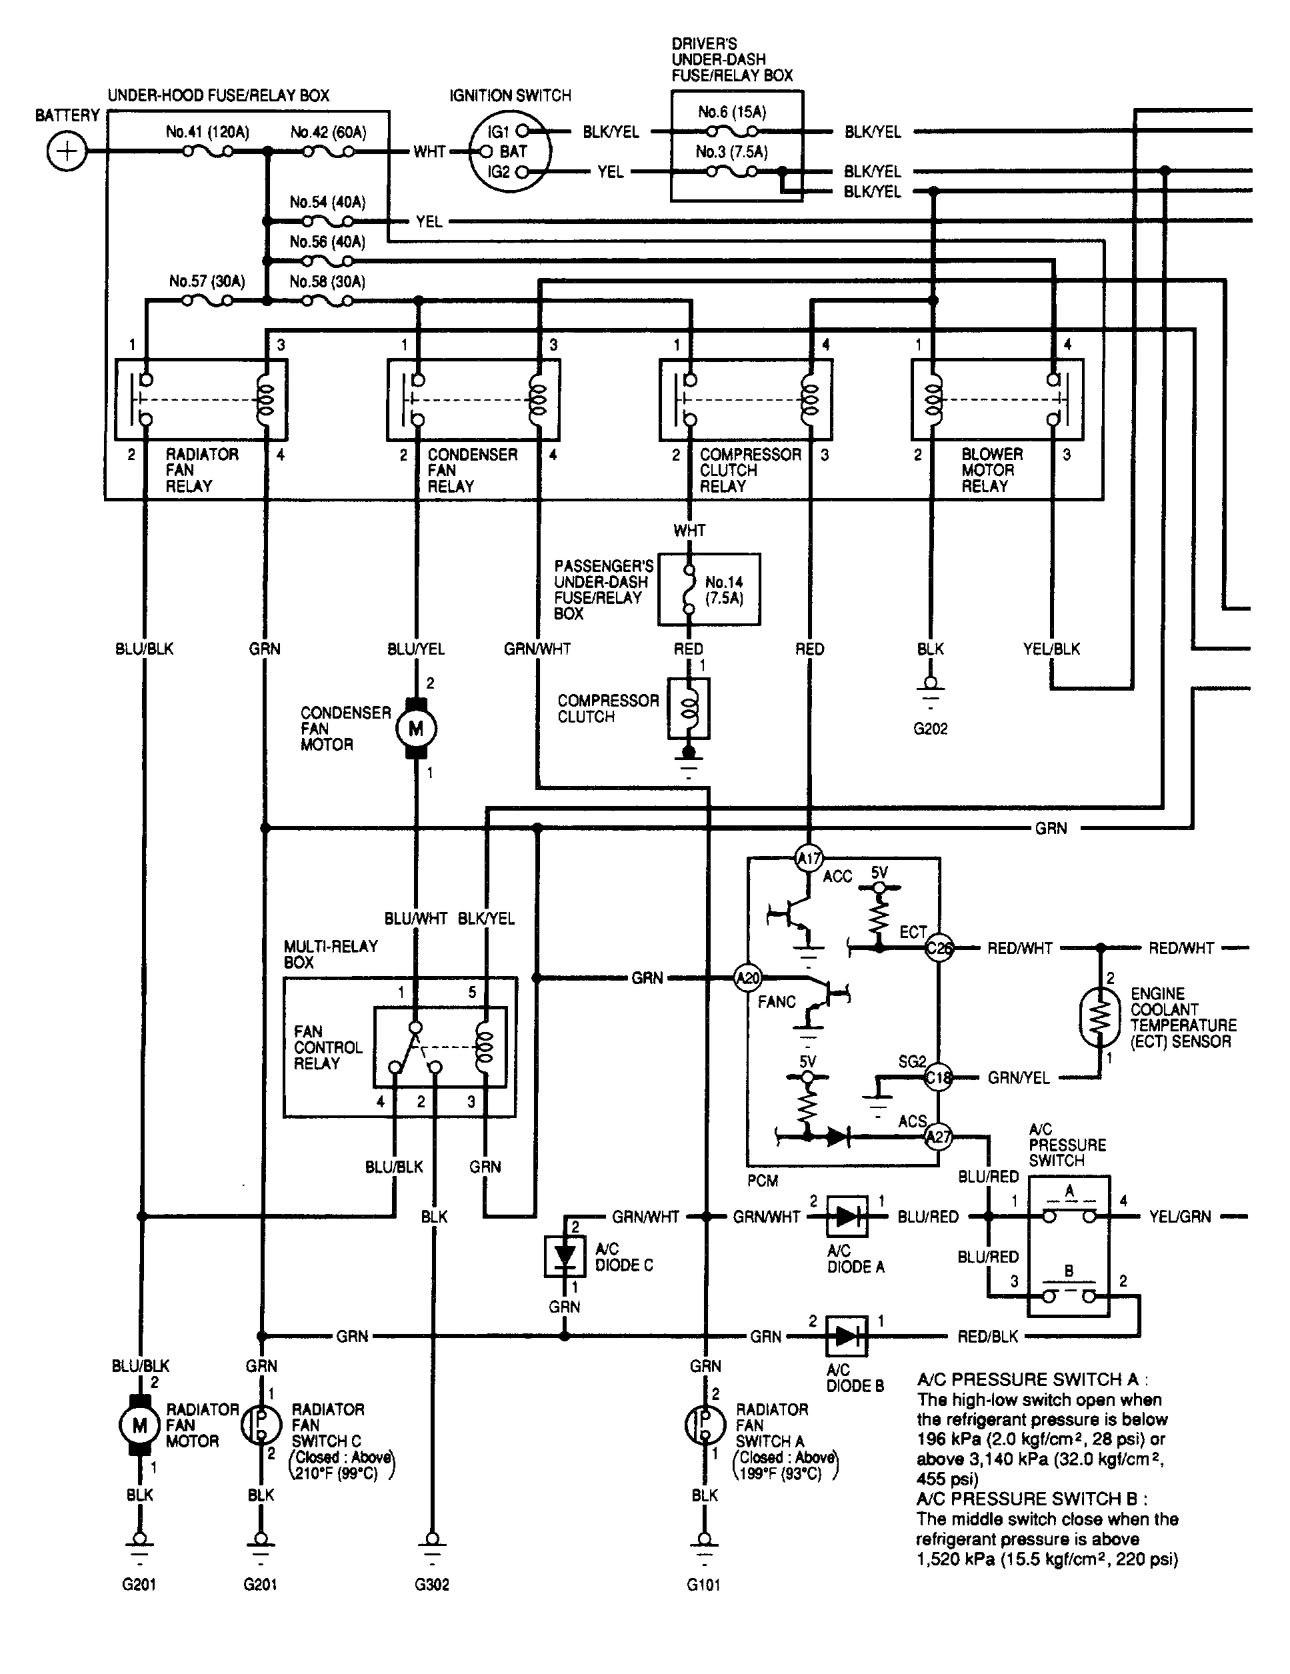 Hvac Control Wiring